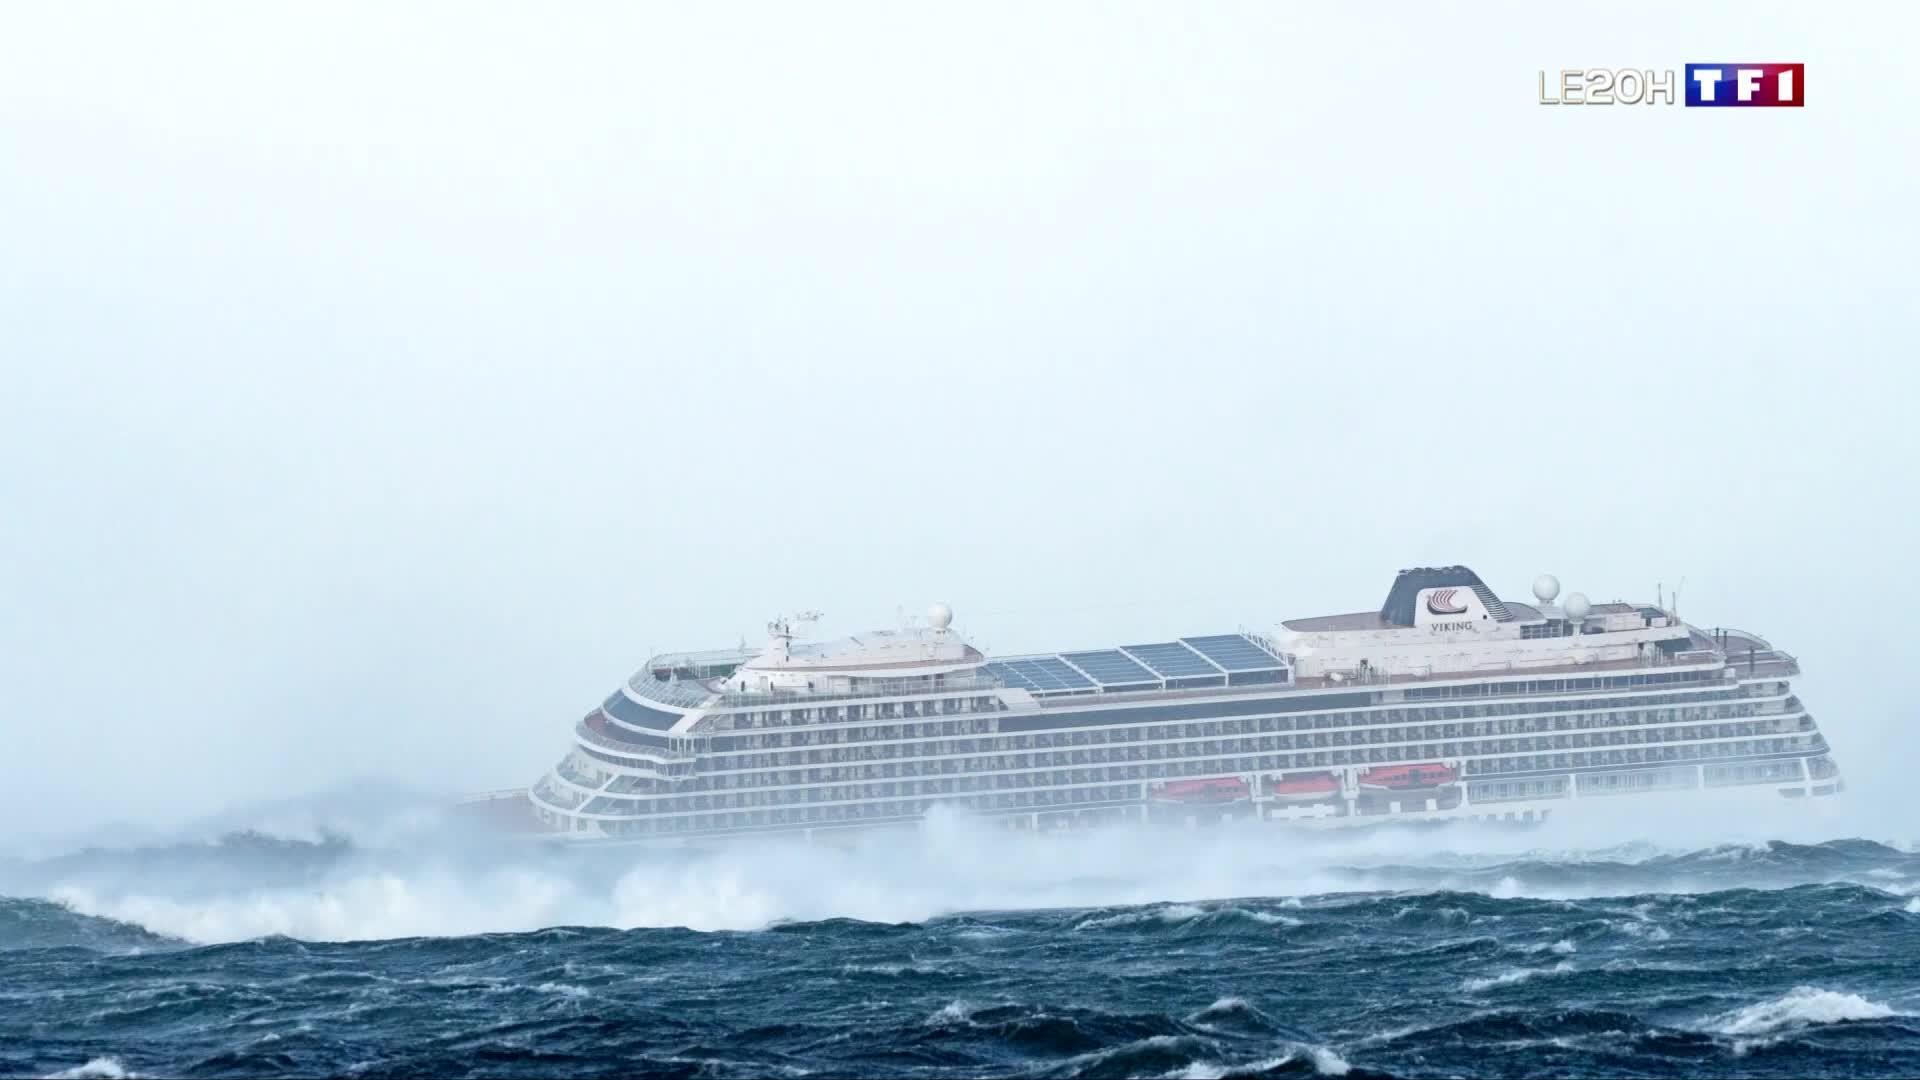 Central cruise : pourquoi choisir cette agence ?